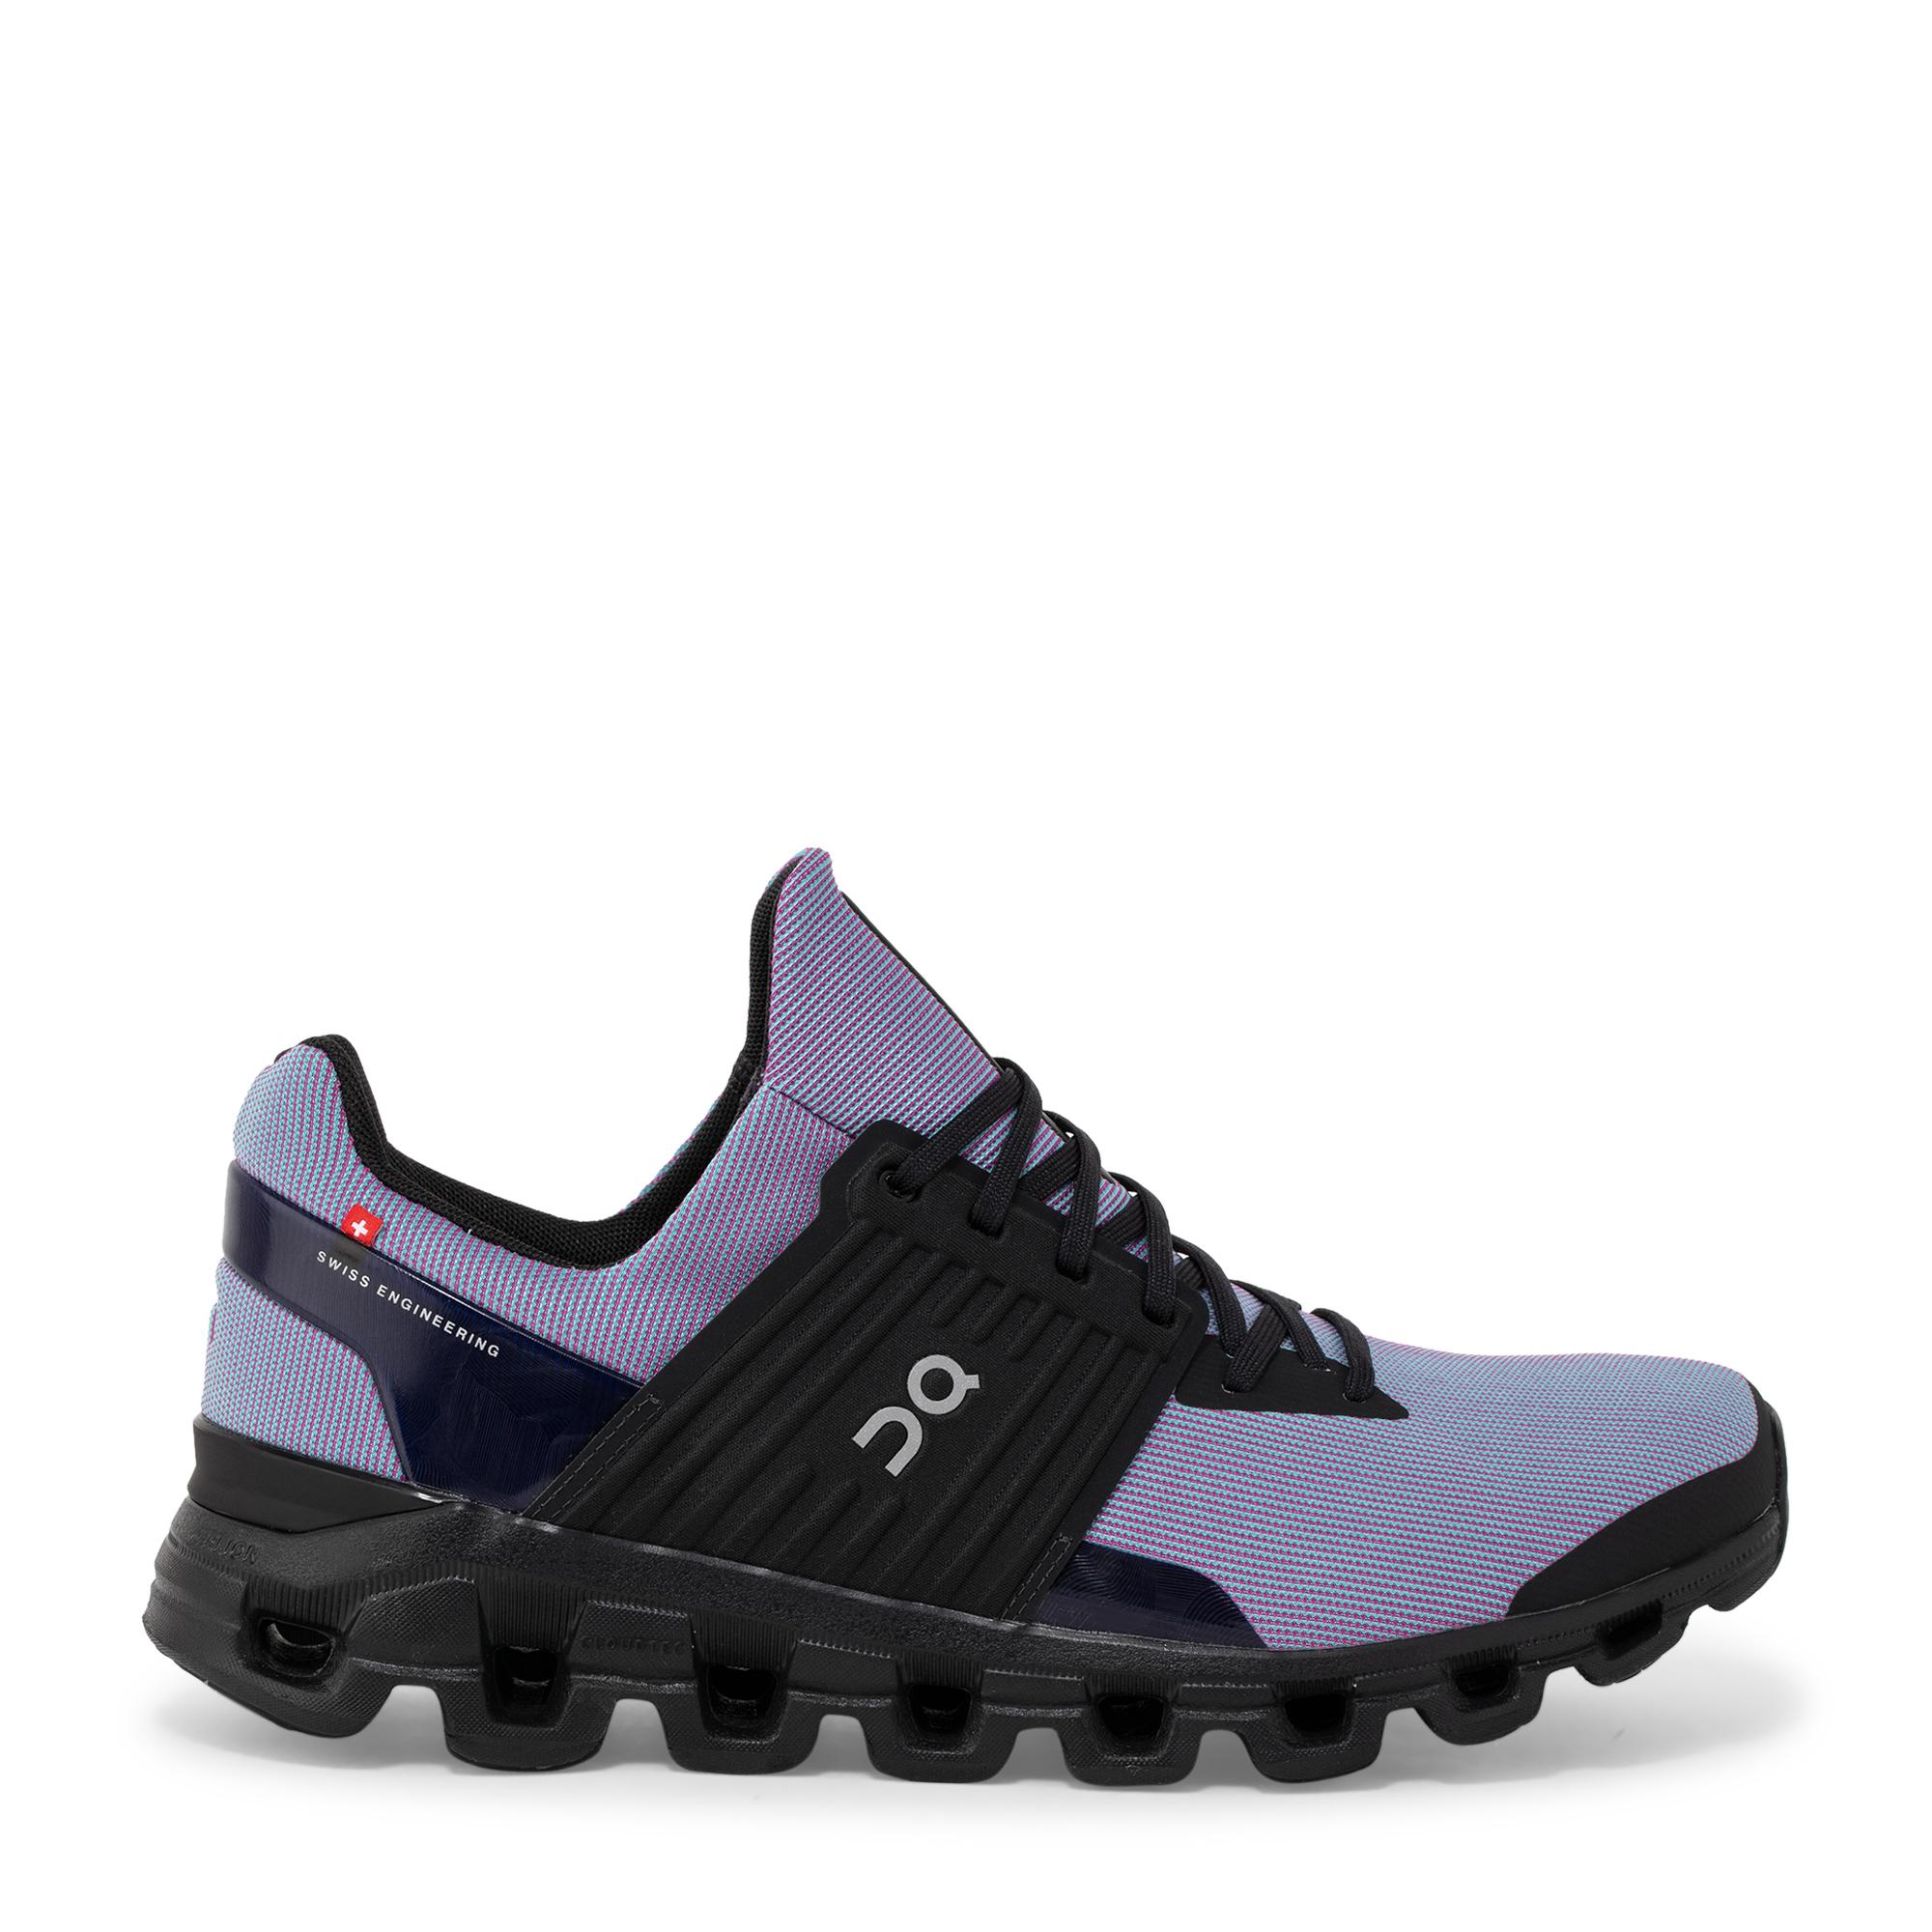 Cloudswift Edge Prism sneakers